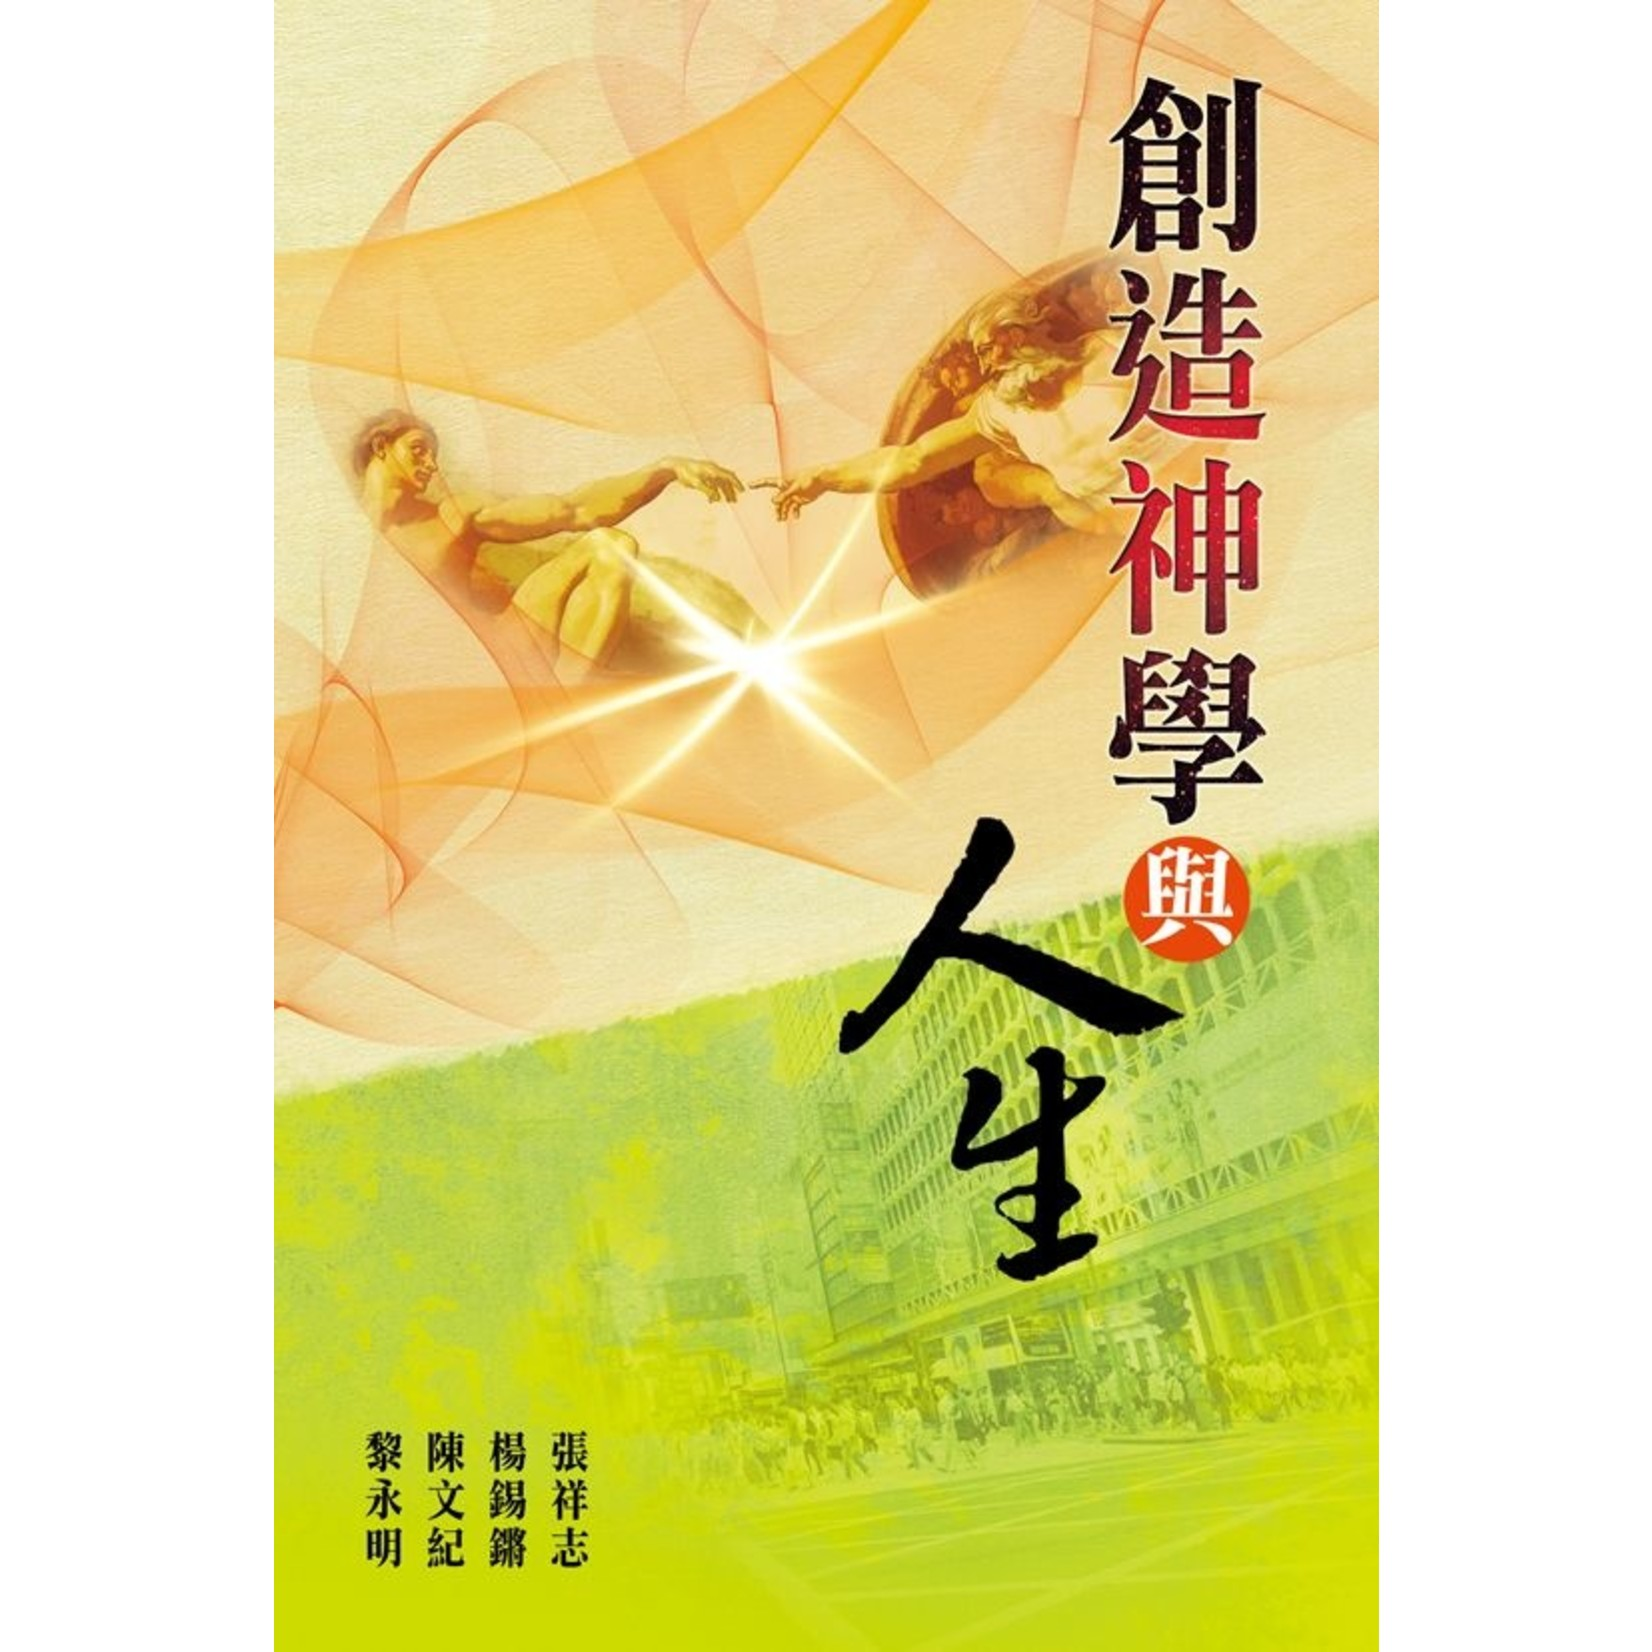 天道書樓 Tien Dao Publishing House 創造神學與人生